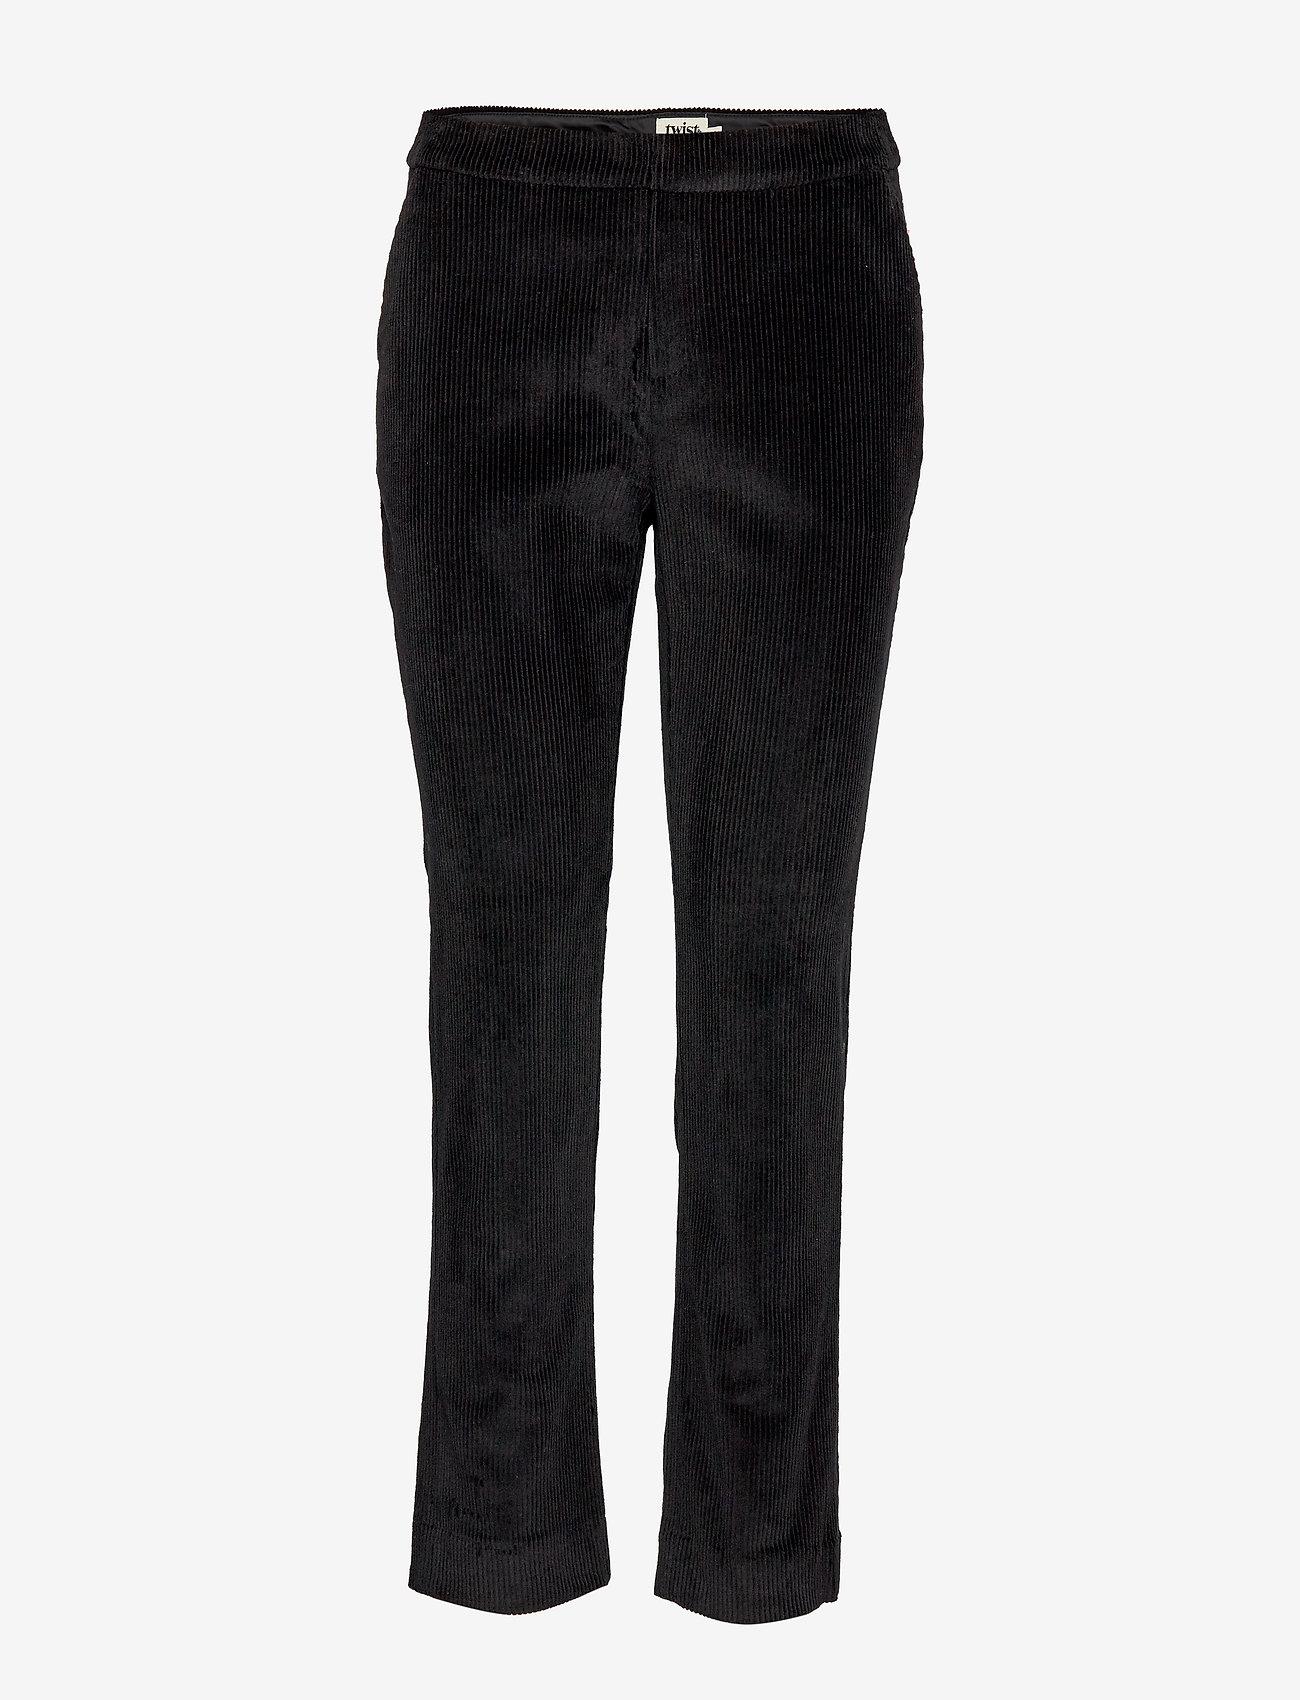 Twist & Tango - Lilly Cord Trousers - pantalons droits - black - 0